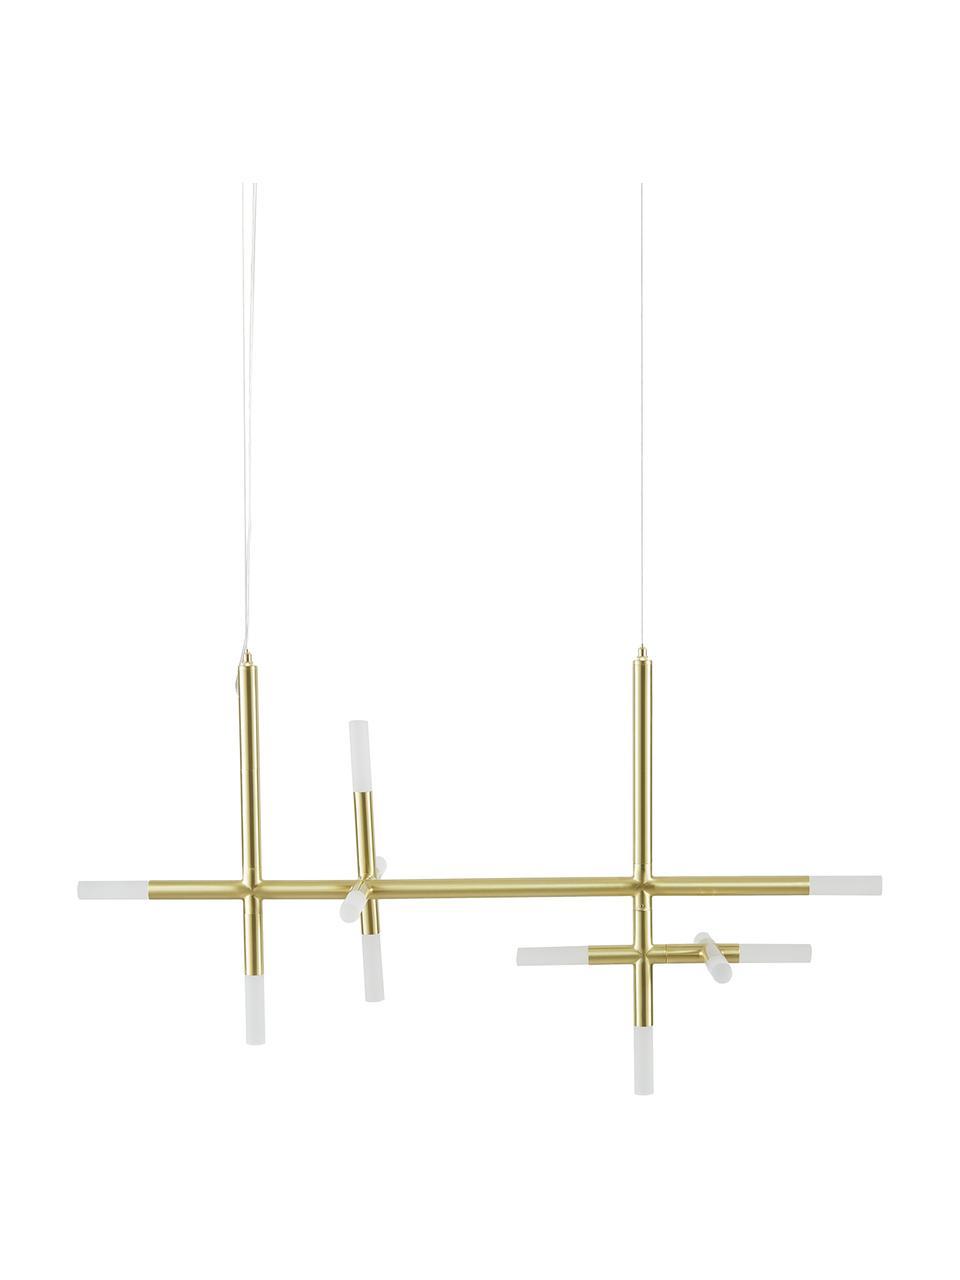 Große LED-Pendelleuchte Gratia in Gold, Baldachin: Metall, galvanisiert, Gold, 90 x 90 cm